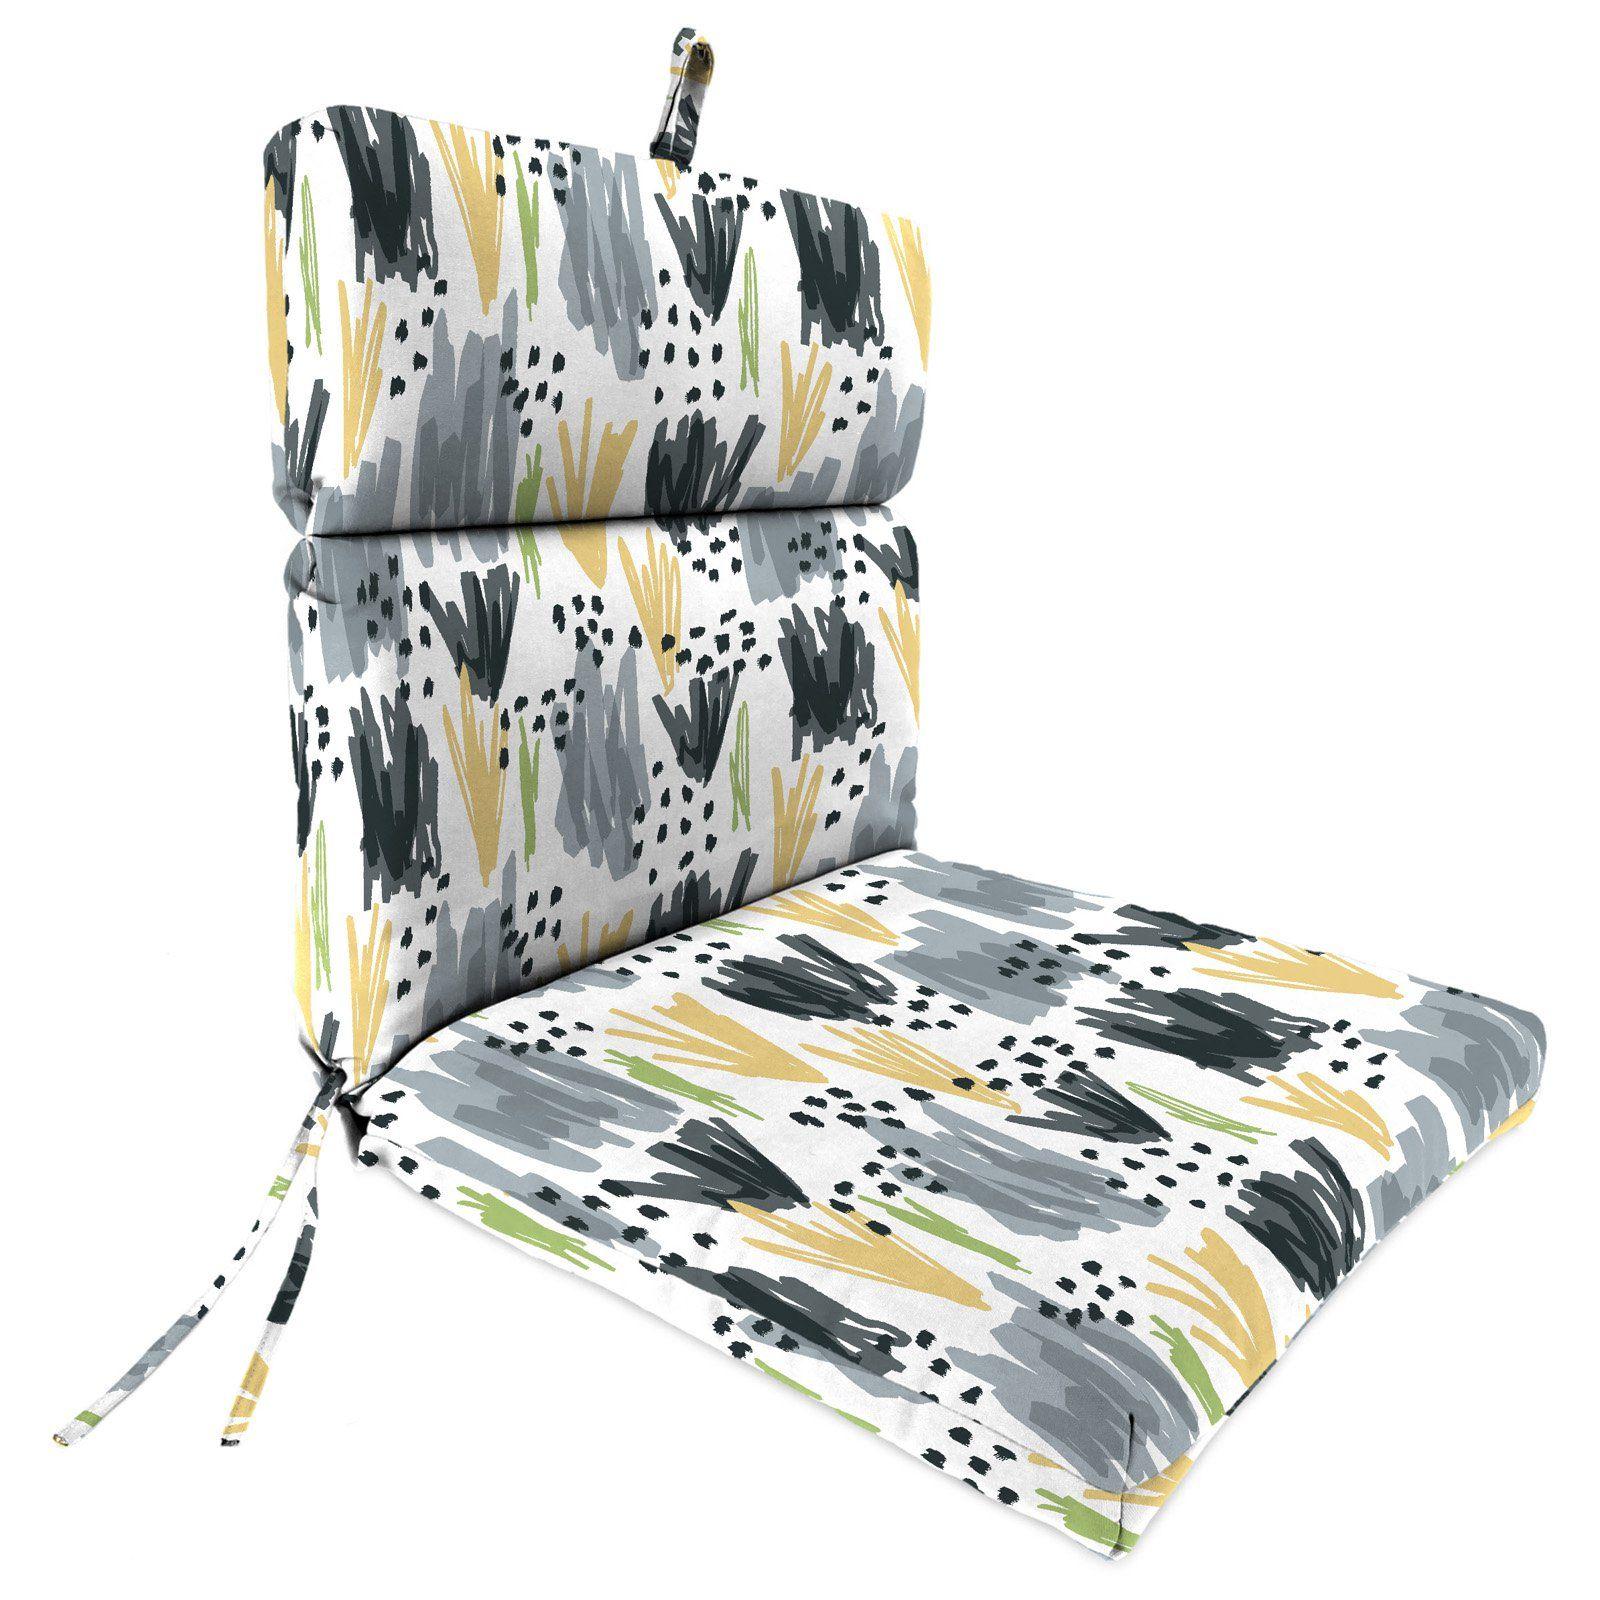 Jordan Manufacturing Stone Outdoor Floral French Edge Patio Chair Cushion In 2021 Chair Cushions Patio Chair Cushions Outdoor Cushions And Pillows